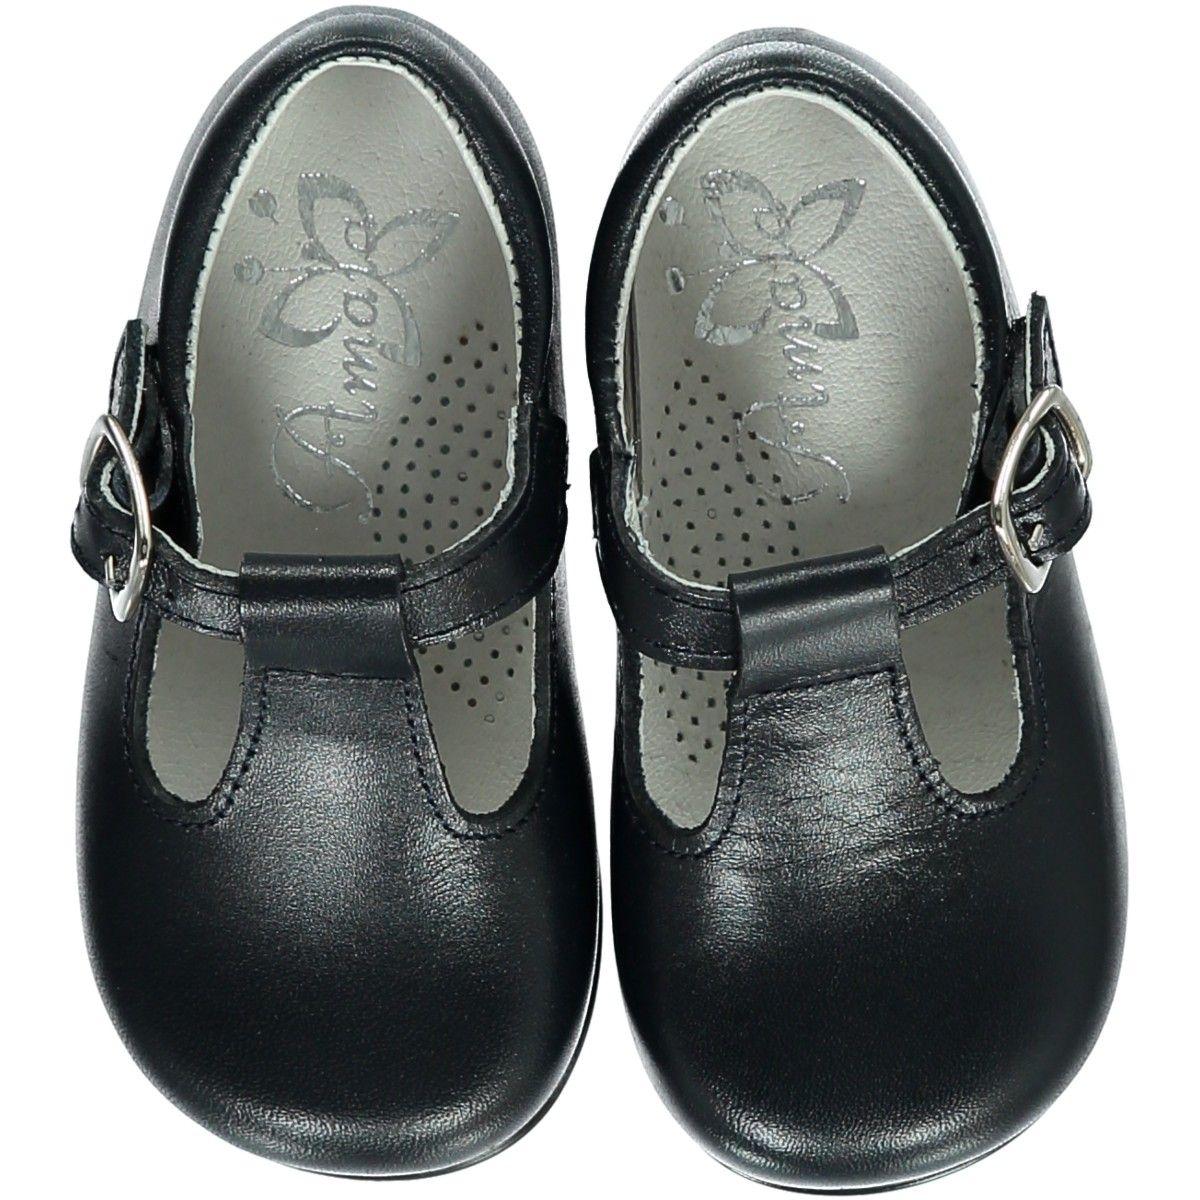 Soft Baby Boy t-bar shoes - Navy em